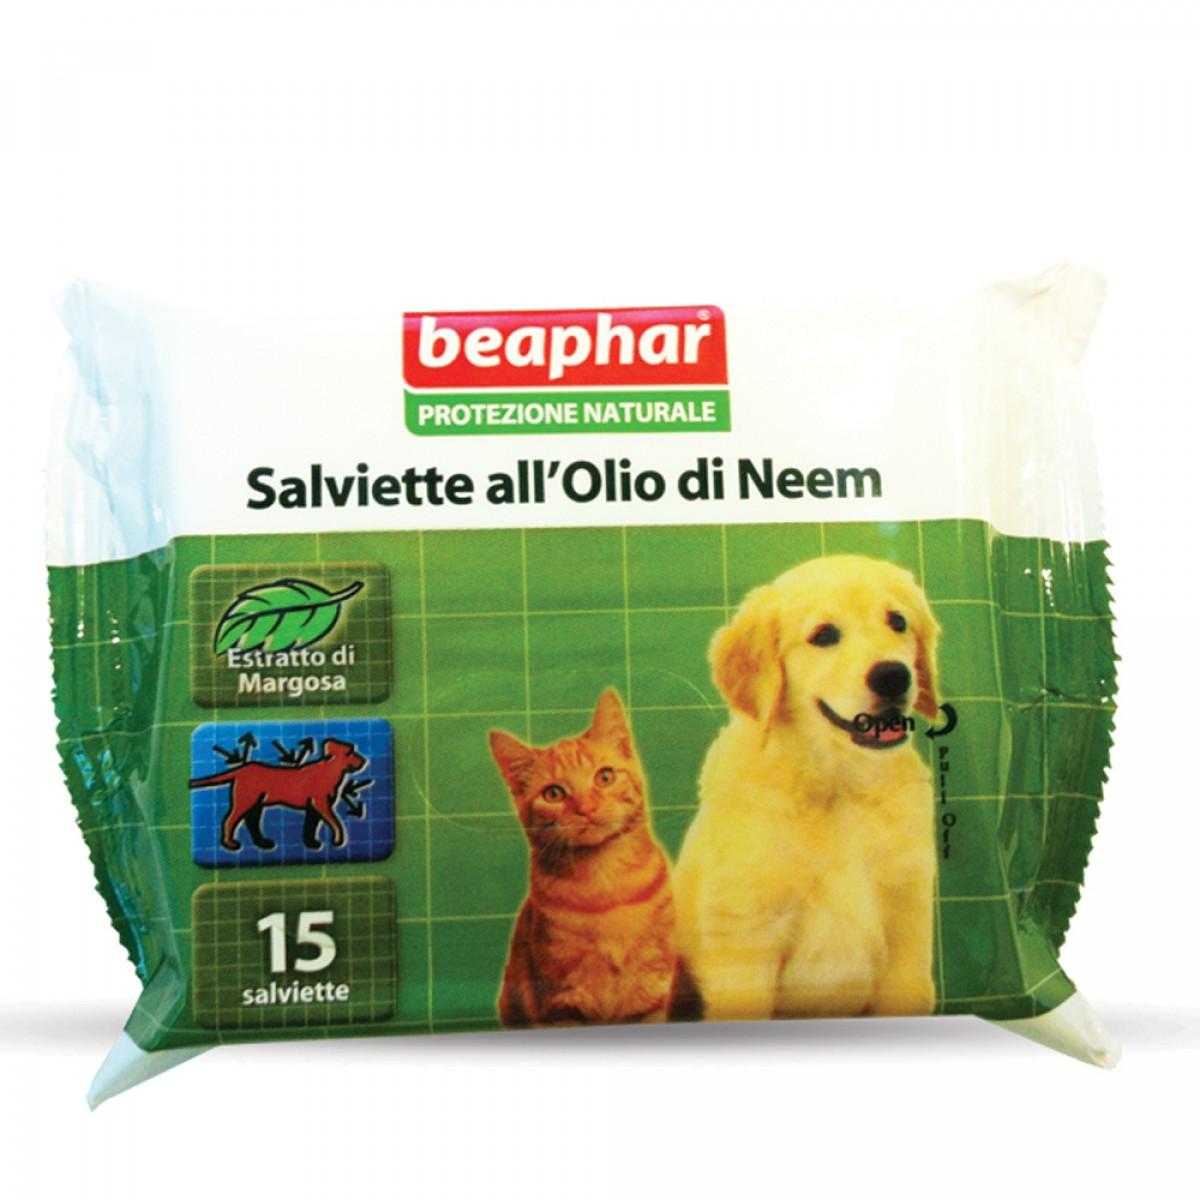 Image of Beaphar Protezione Naturale Salviette All'Olio Di Neem 15 Pezzi 924548997